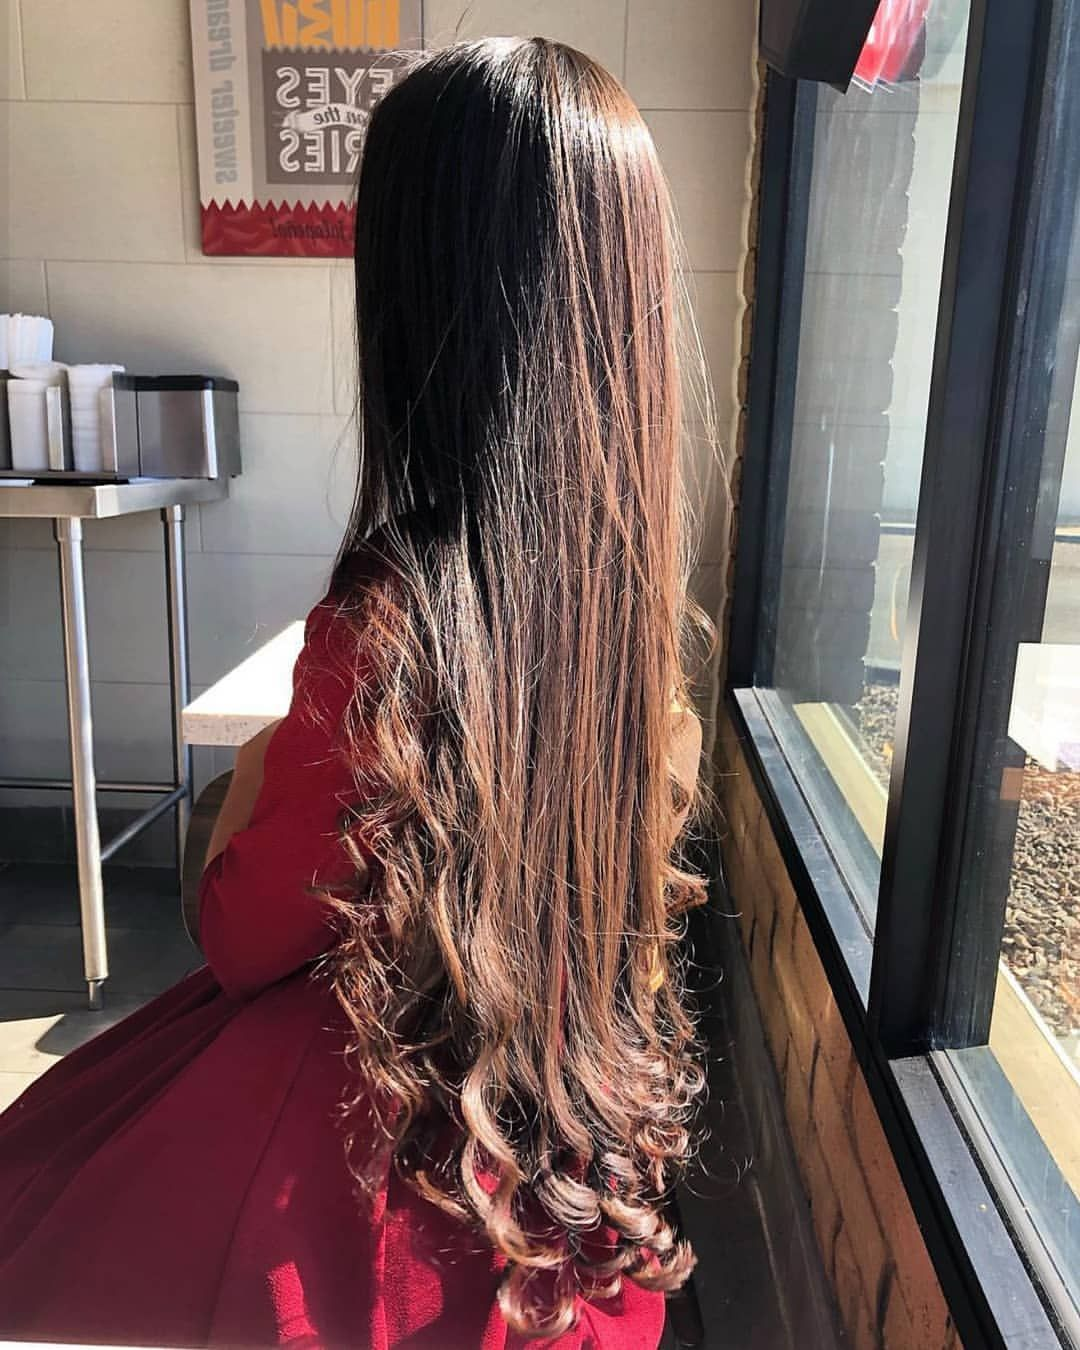 Sexiest Hair Sexiesthair Instagram Photos And Videos Long Hair Styles Hair Styles Haircuts For Long Hair